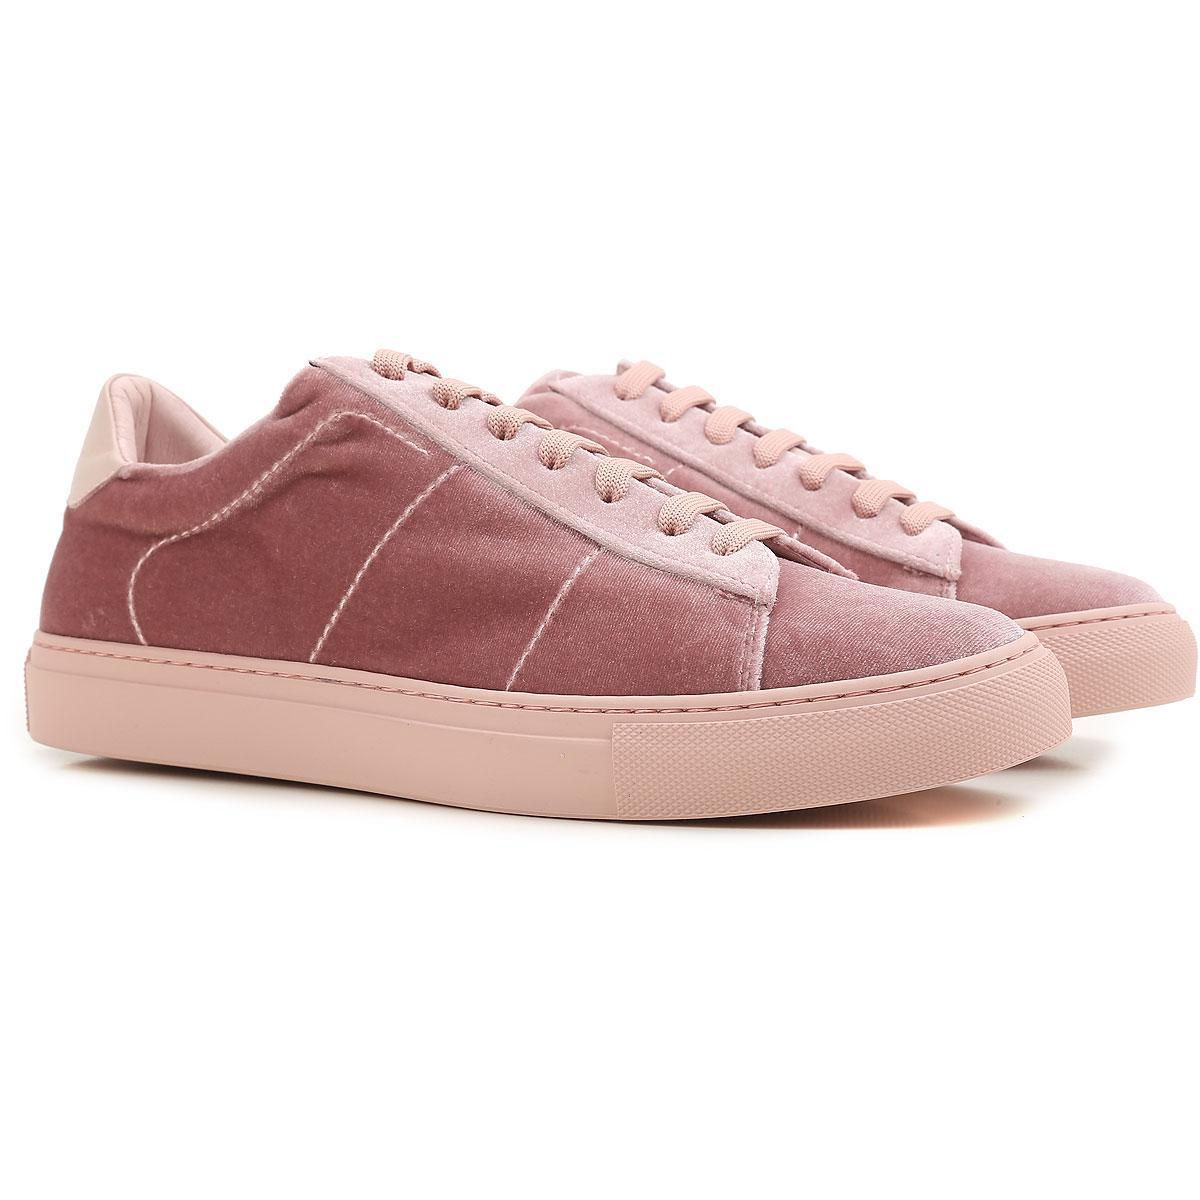 Chaussures De Sport En Velours Dondup L39ikY0k2R